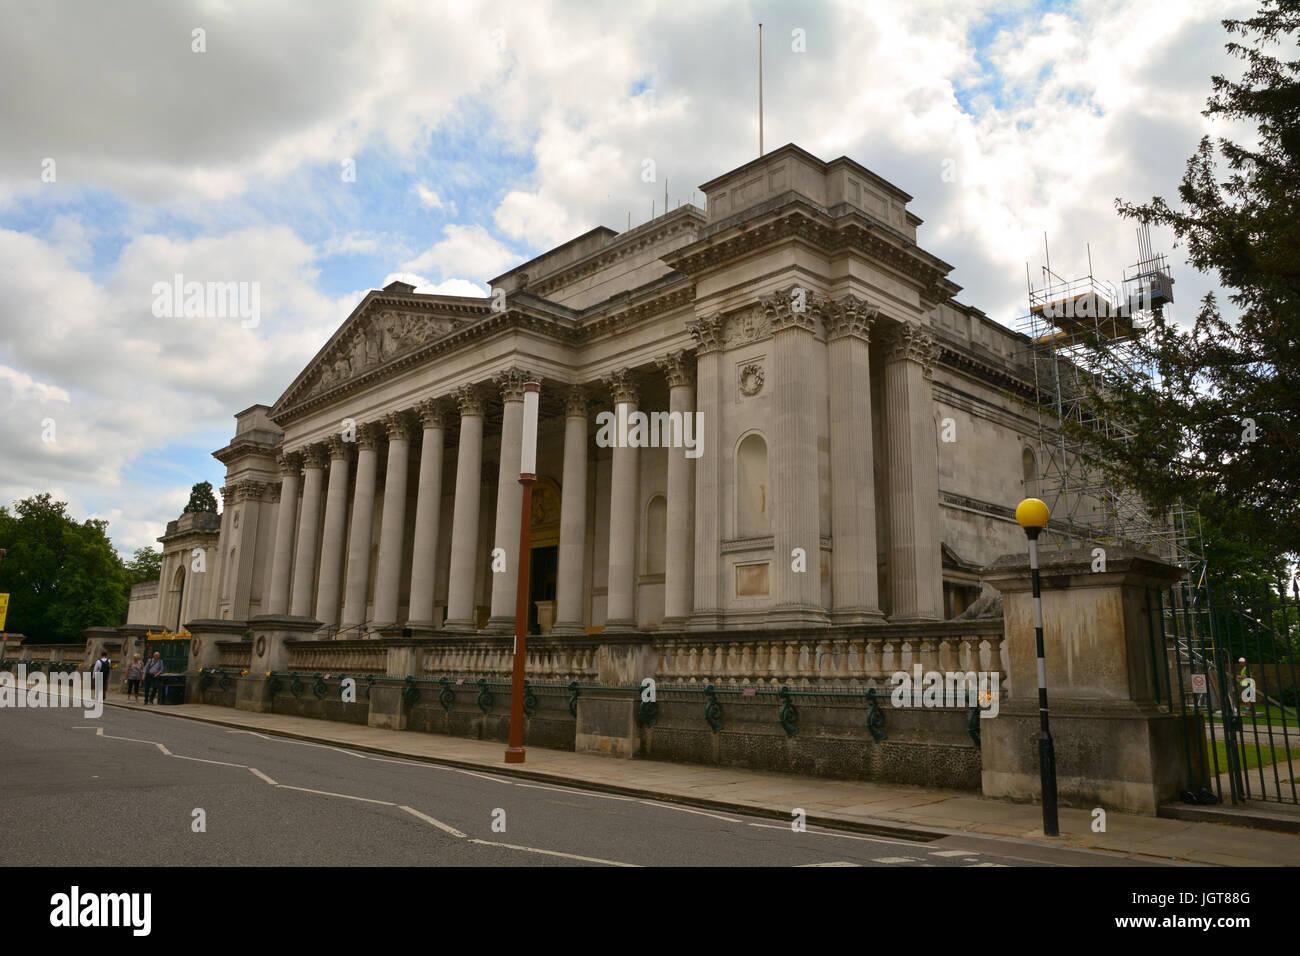 Fitzwilliam Museum - art and antiquities museum of the University of Cambridge located on Trumpington Street Cambridge Stock Photo